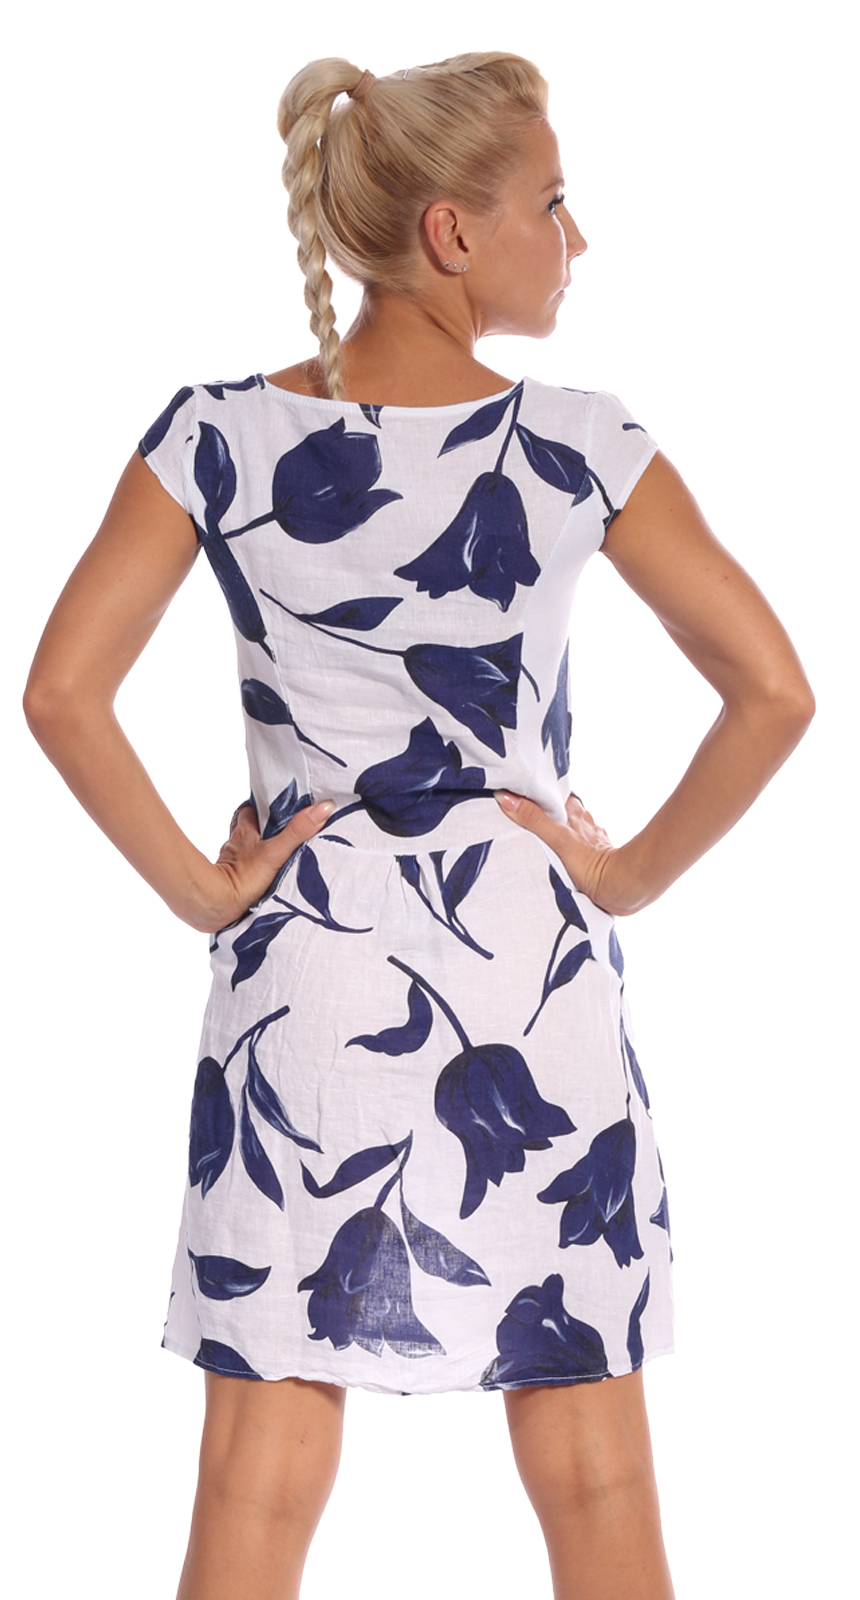 Leinen Kleid Kurzarm Hot Summer Days Exotic Tulip - Mode aus Karlsruhe